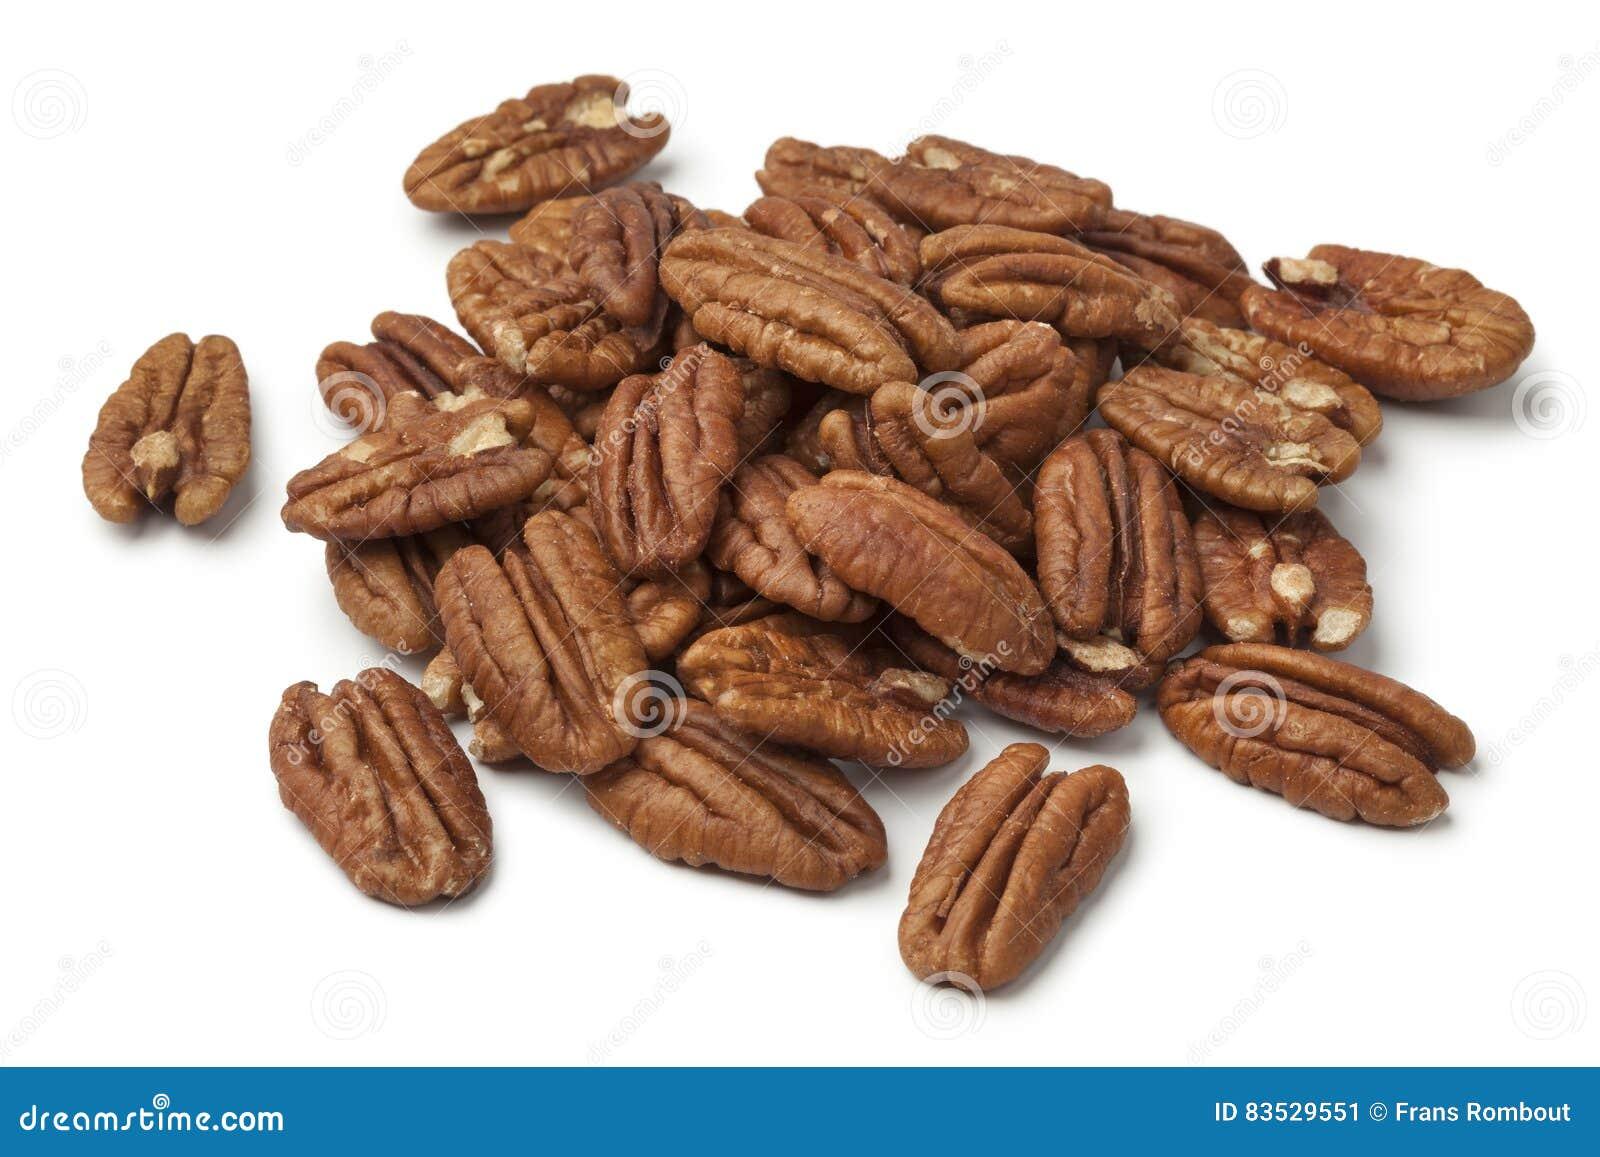 Heap of shelled pecan nuts